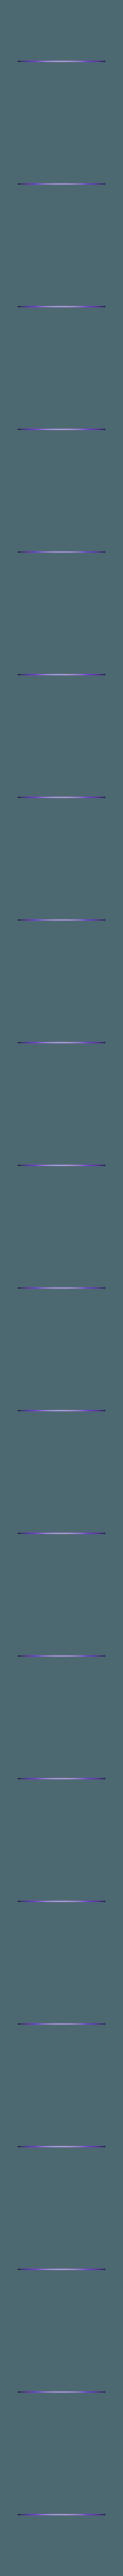 Kings_grey.STL Download free STL file Minimal Multi-color NBA coasters • 3D print object, MosaicManufacturing